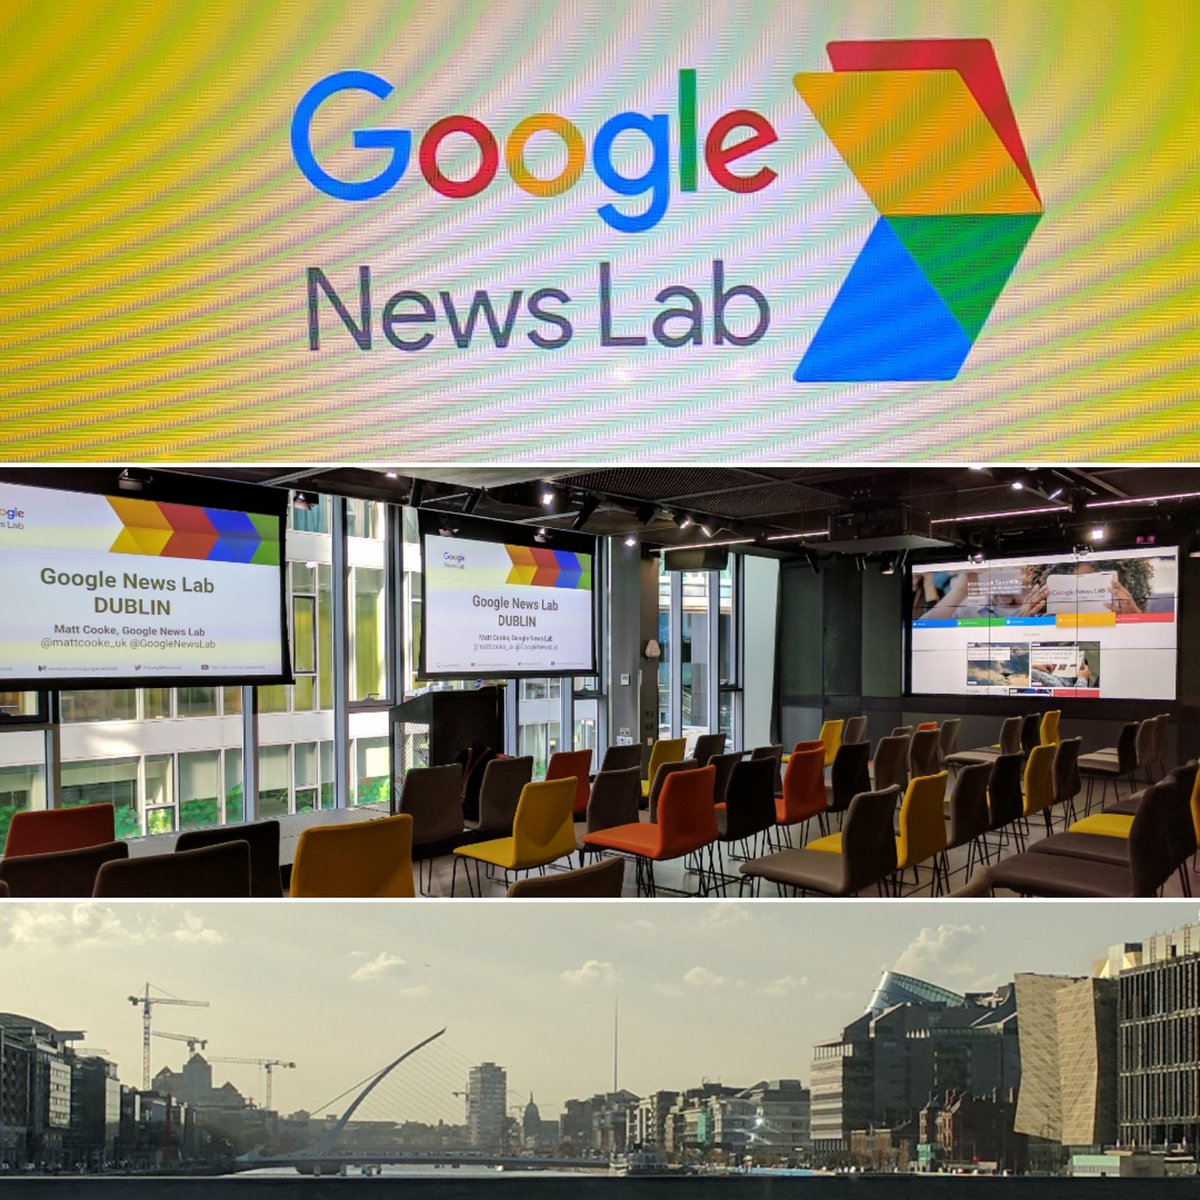 google news lab googlenewslab twitter